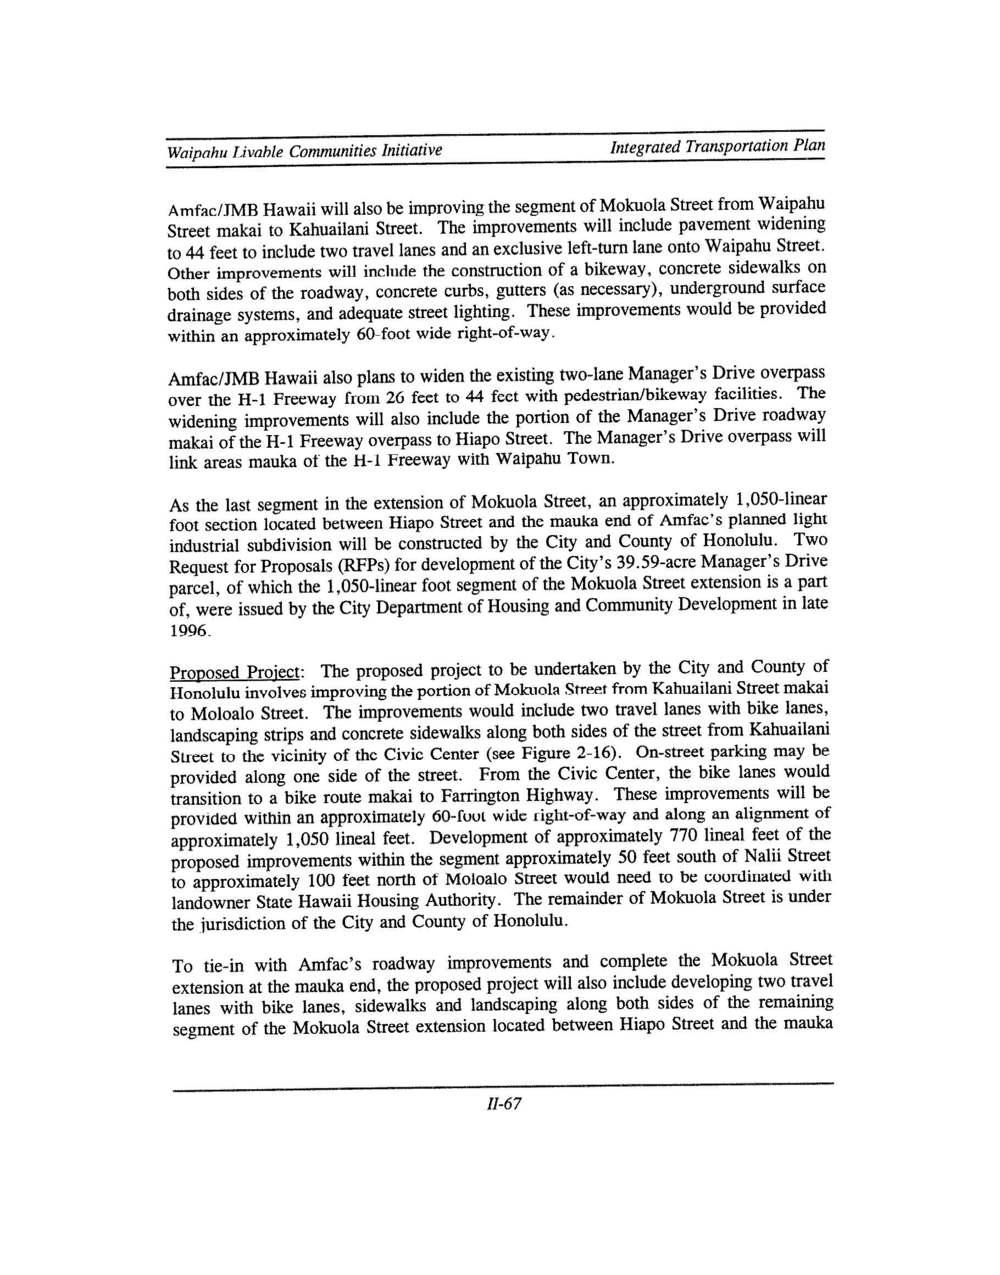 160531_WaipahuLivableCommunities(1998)_Page_082.jpg